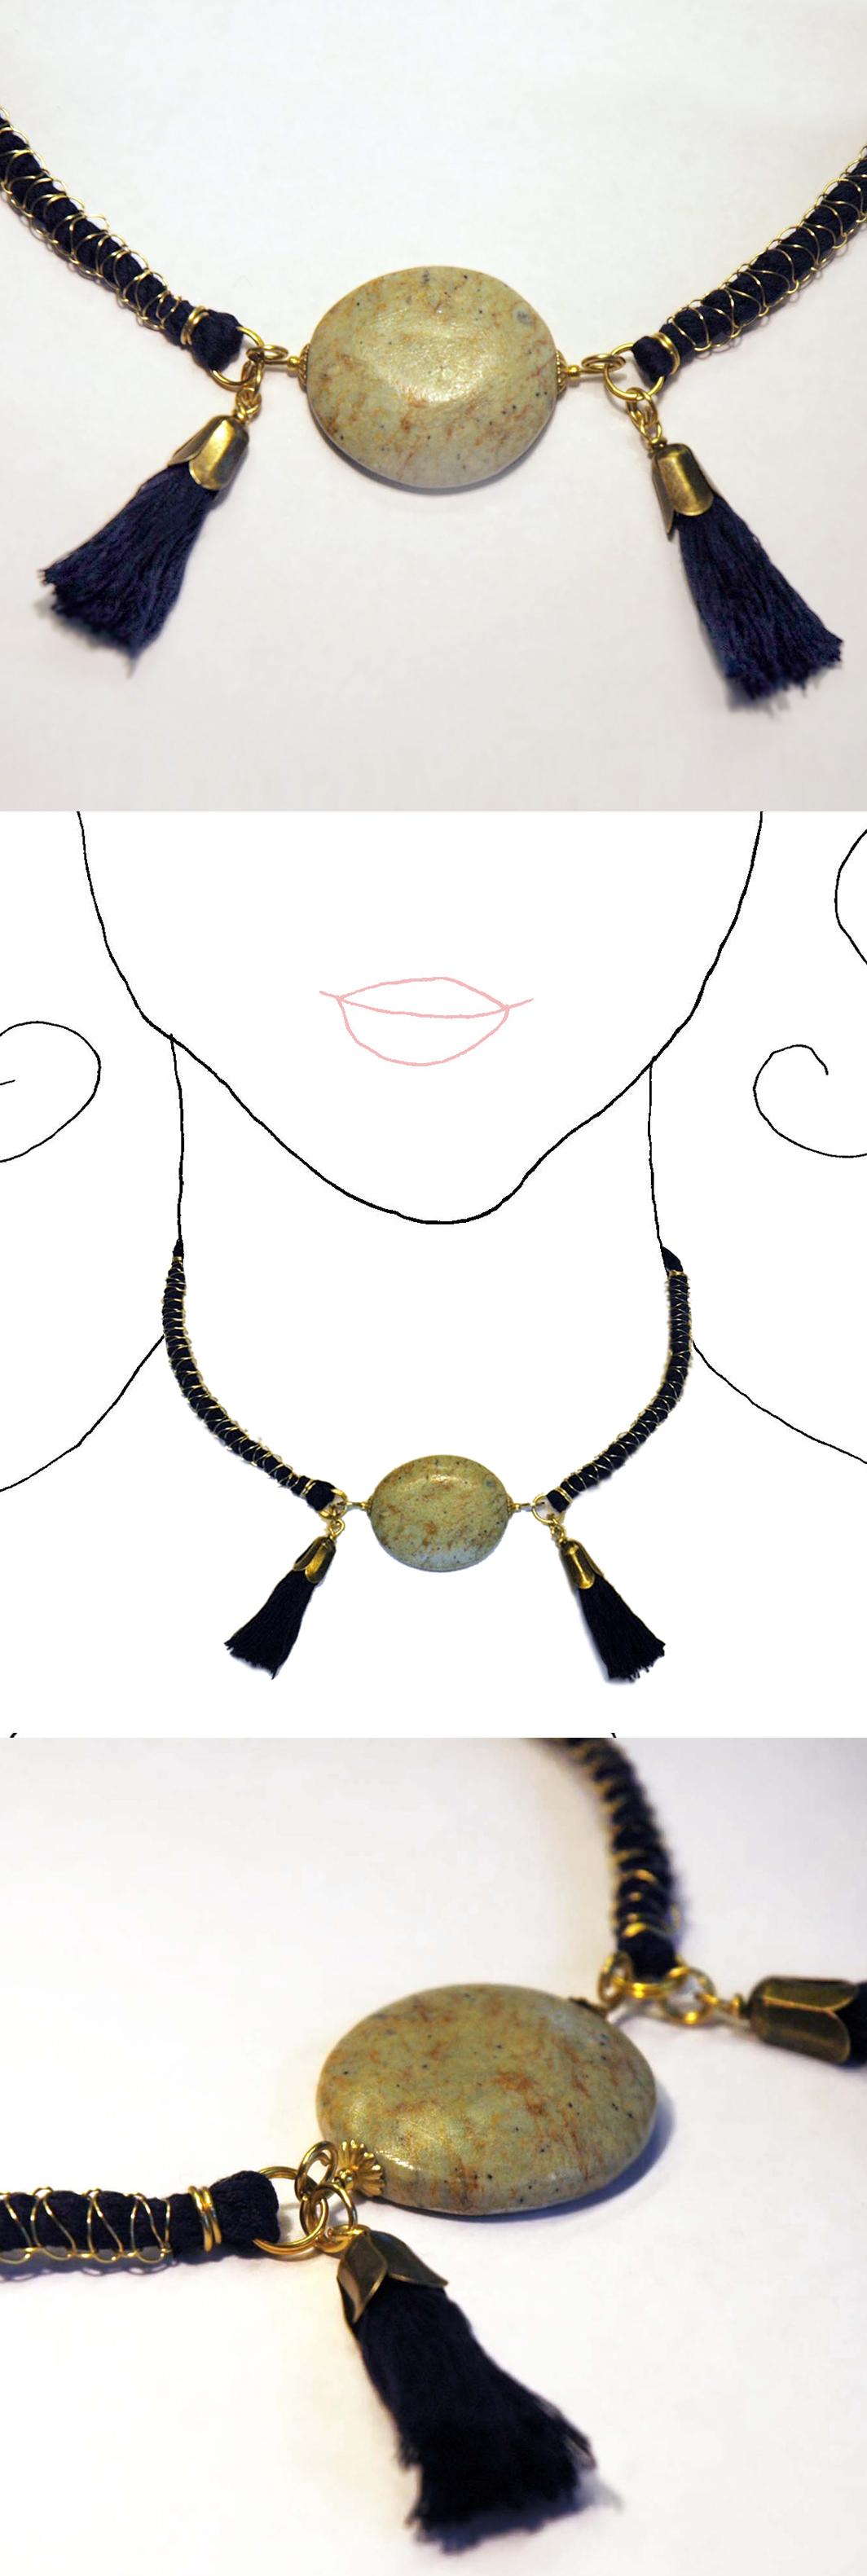 Handmade necklace. Unique design. All the collection at www.caixademistos.com  Online Shop at Dawanda: http://en.dawanda.com/product/44885418-Collar-V